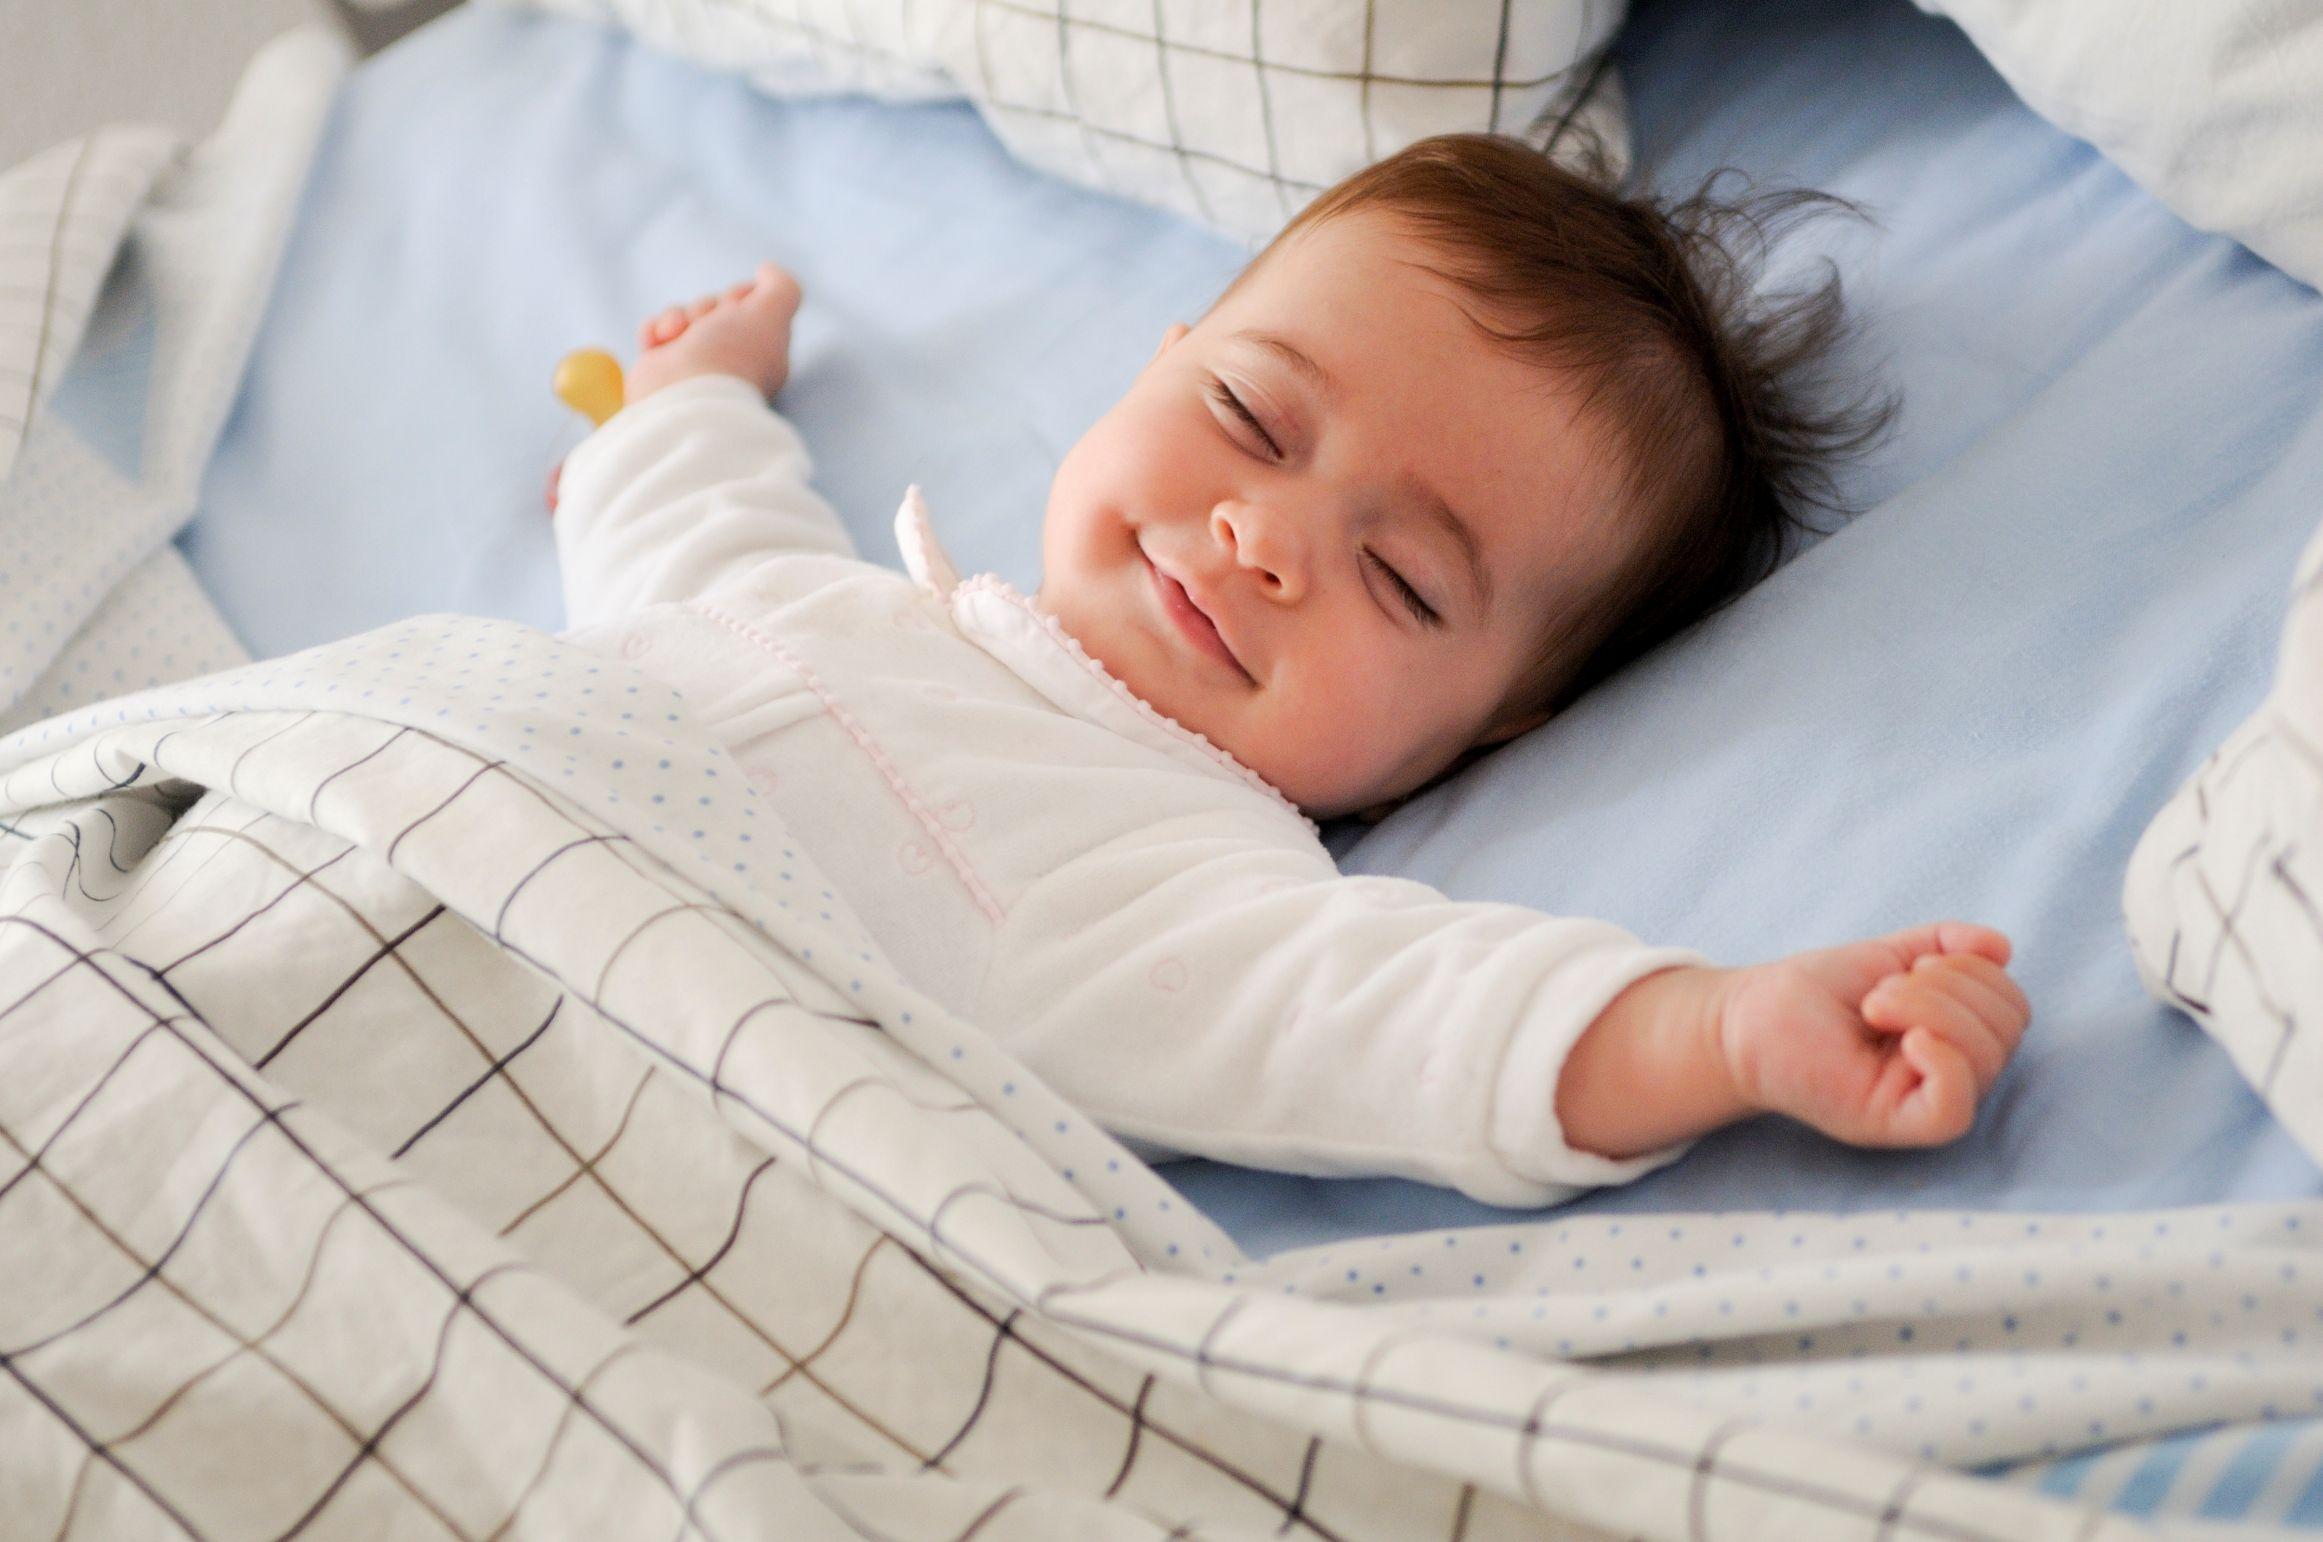 Funny Baby Meme Creator : Sleeping baby meme generator baby.best of the funny meme